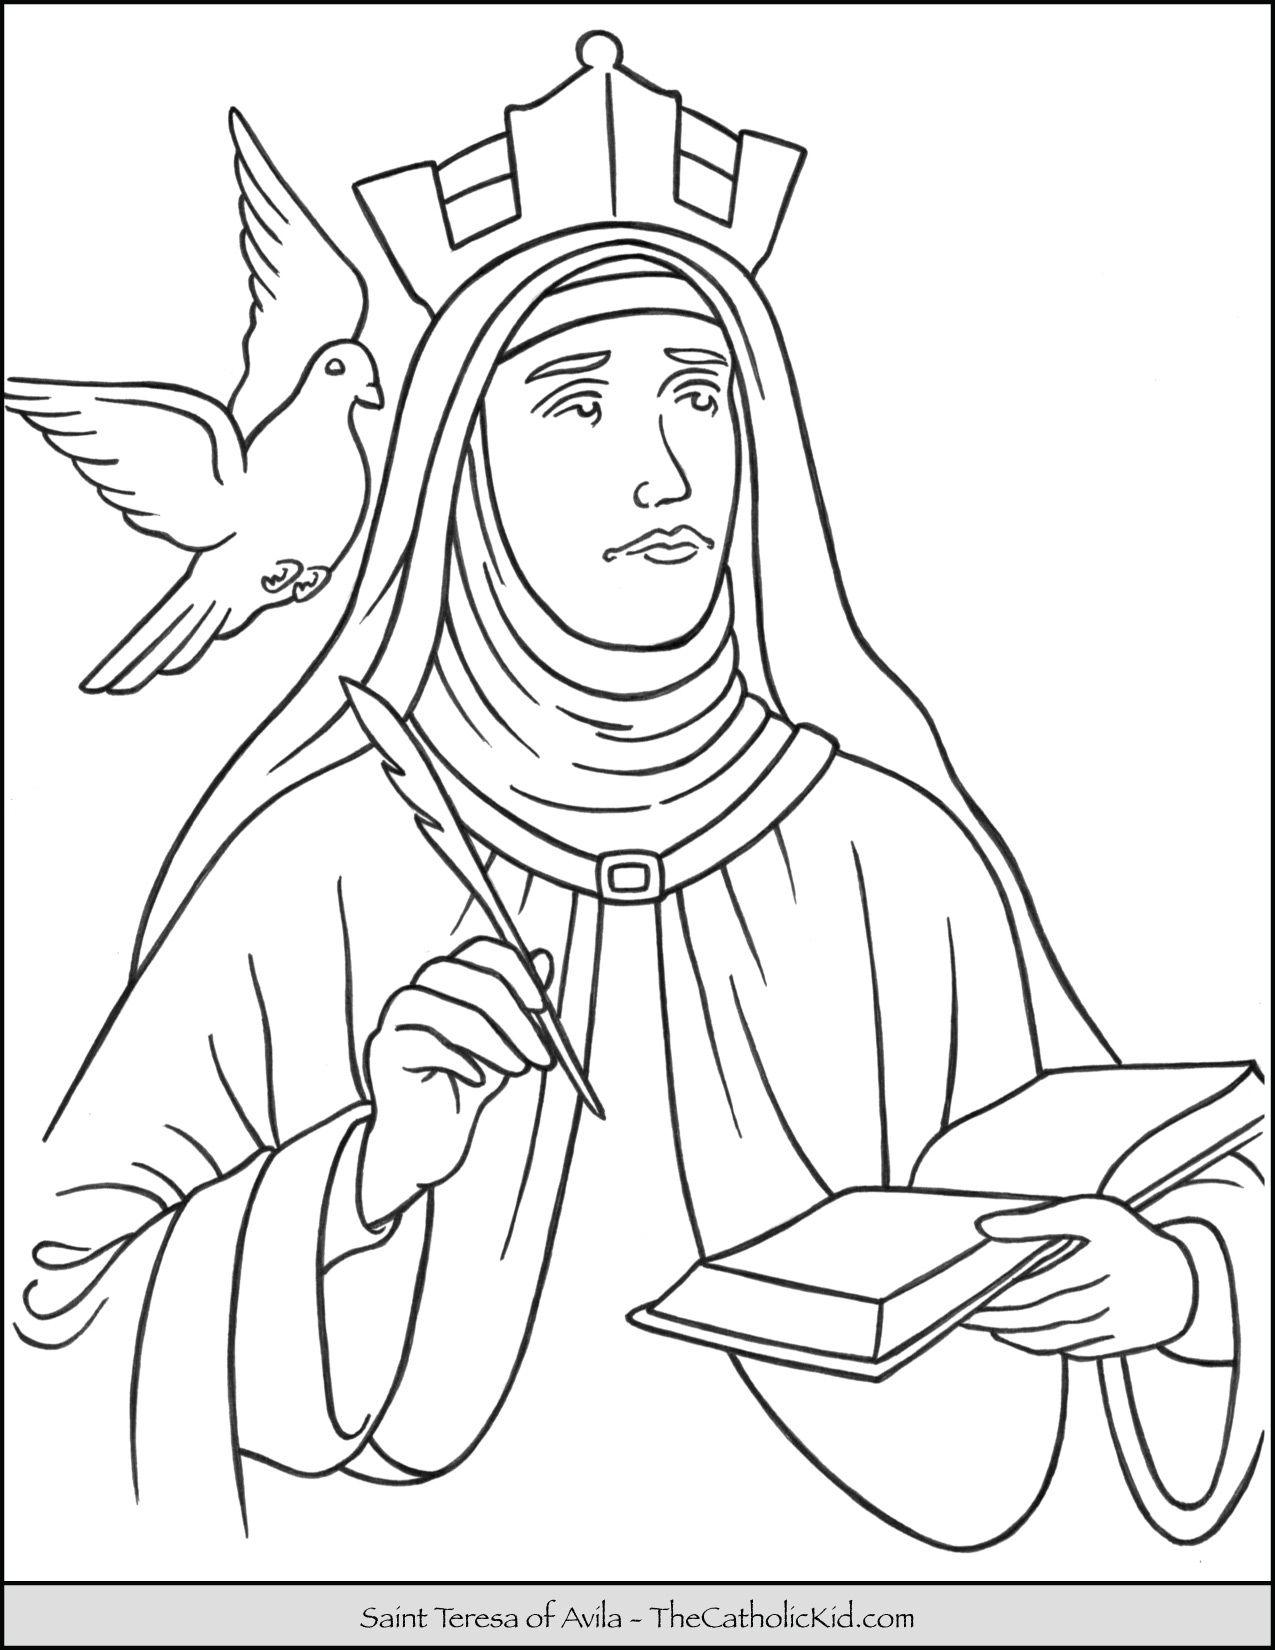 Saint Teresa Of Avila Coloring Page Thecatholickid Com Saint